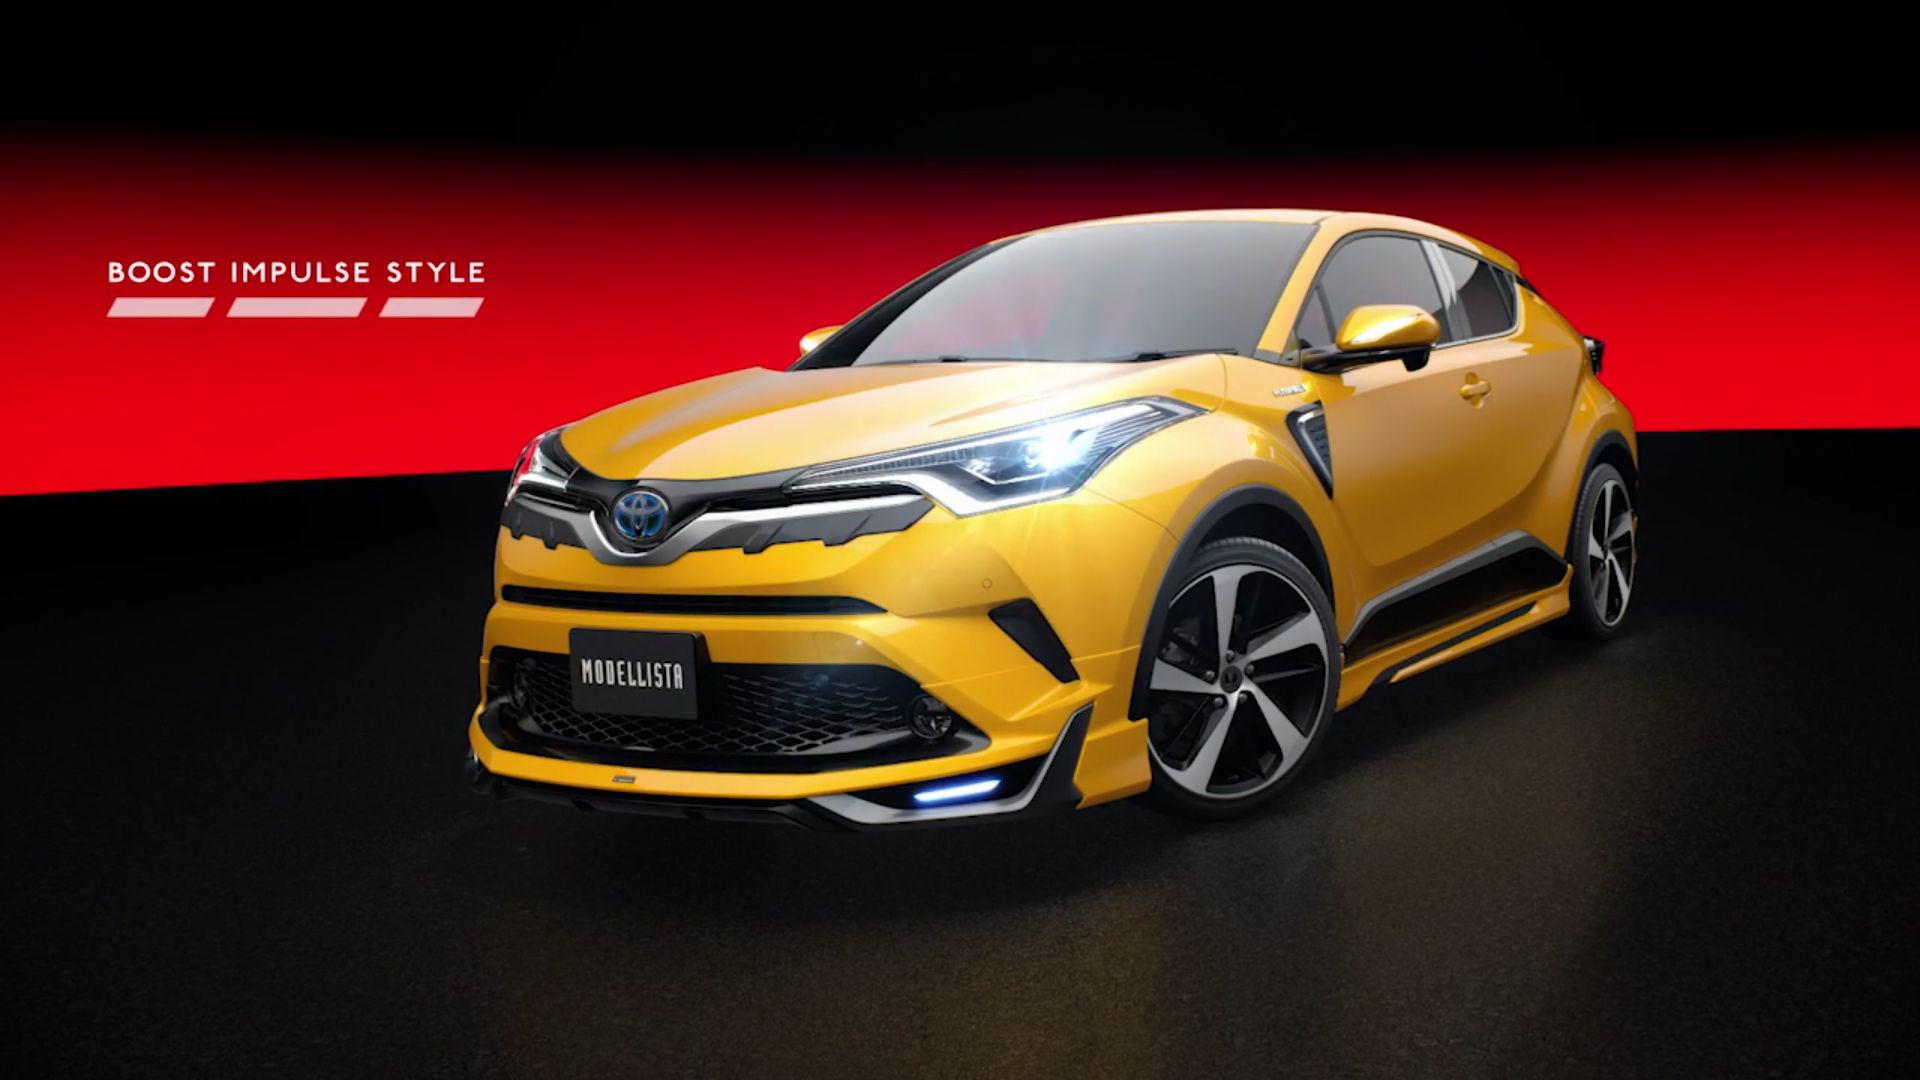 Eye-searing Toyota C-HR Modellista body kits ready for Japan